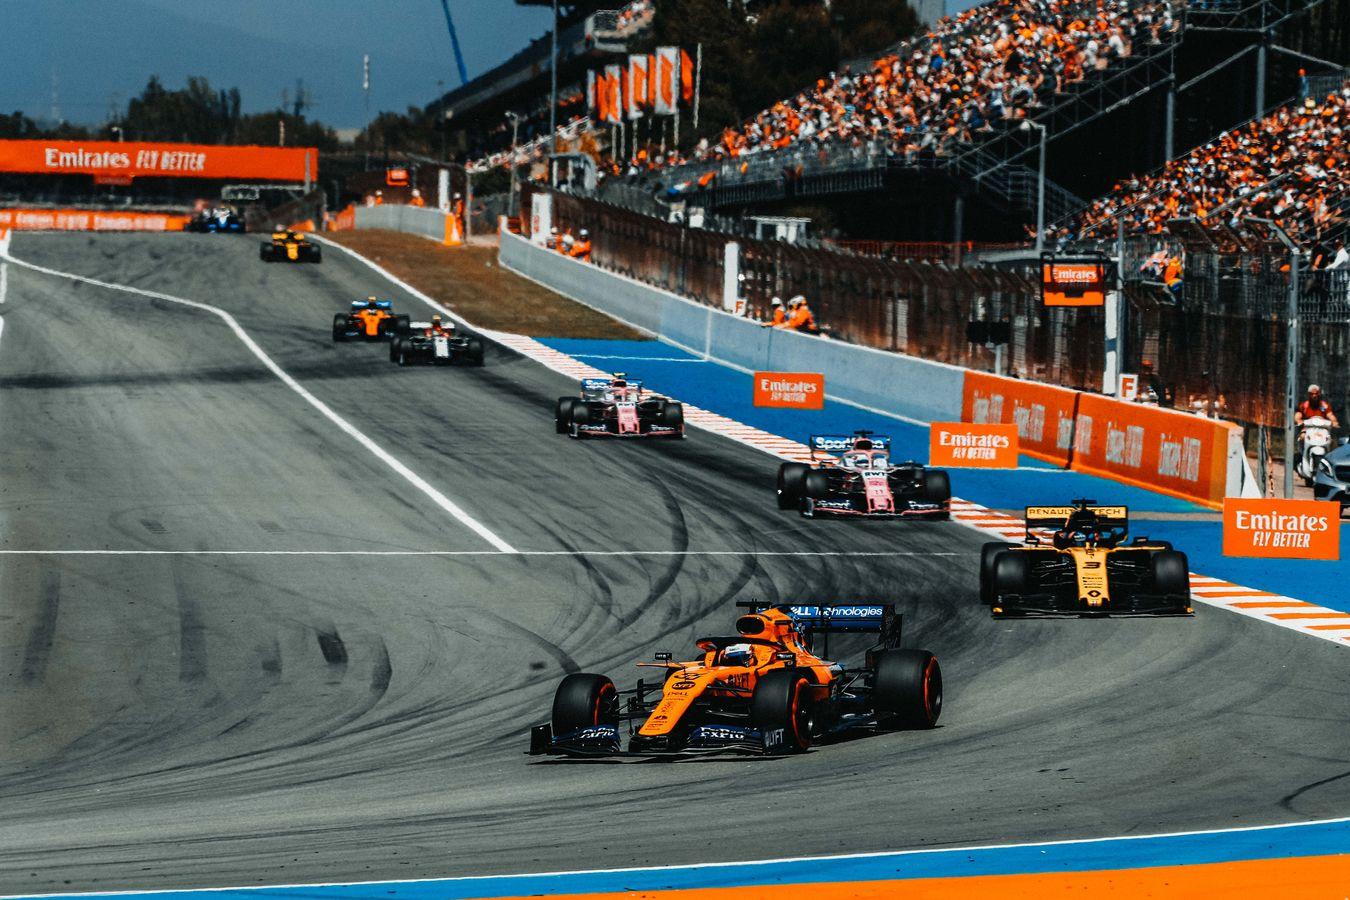 Copyright: McLaren